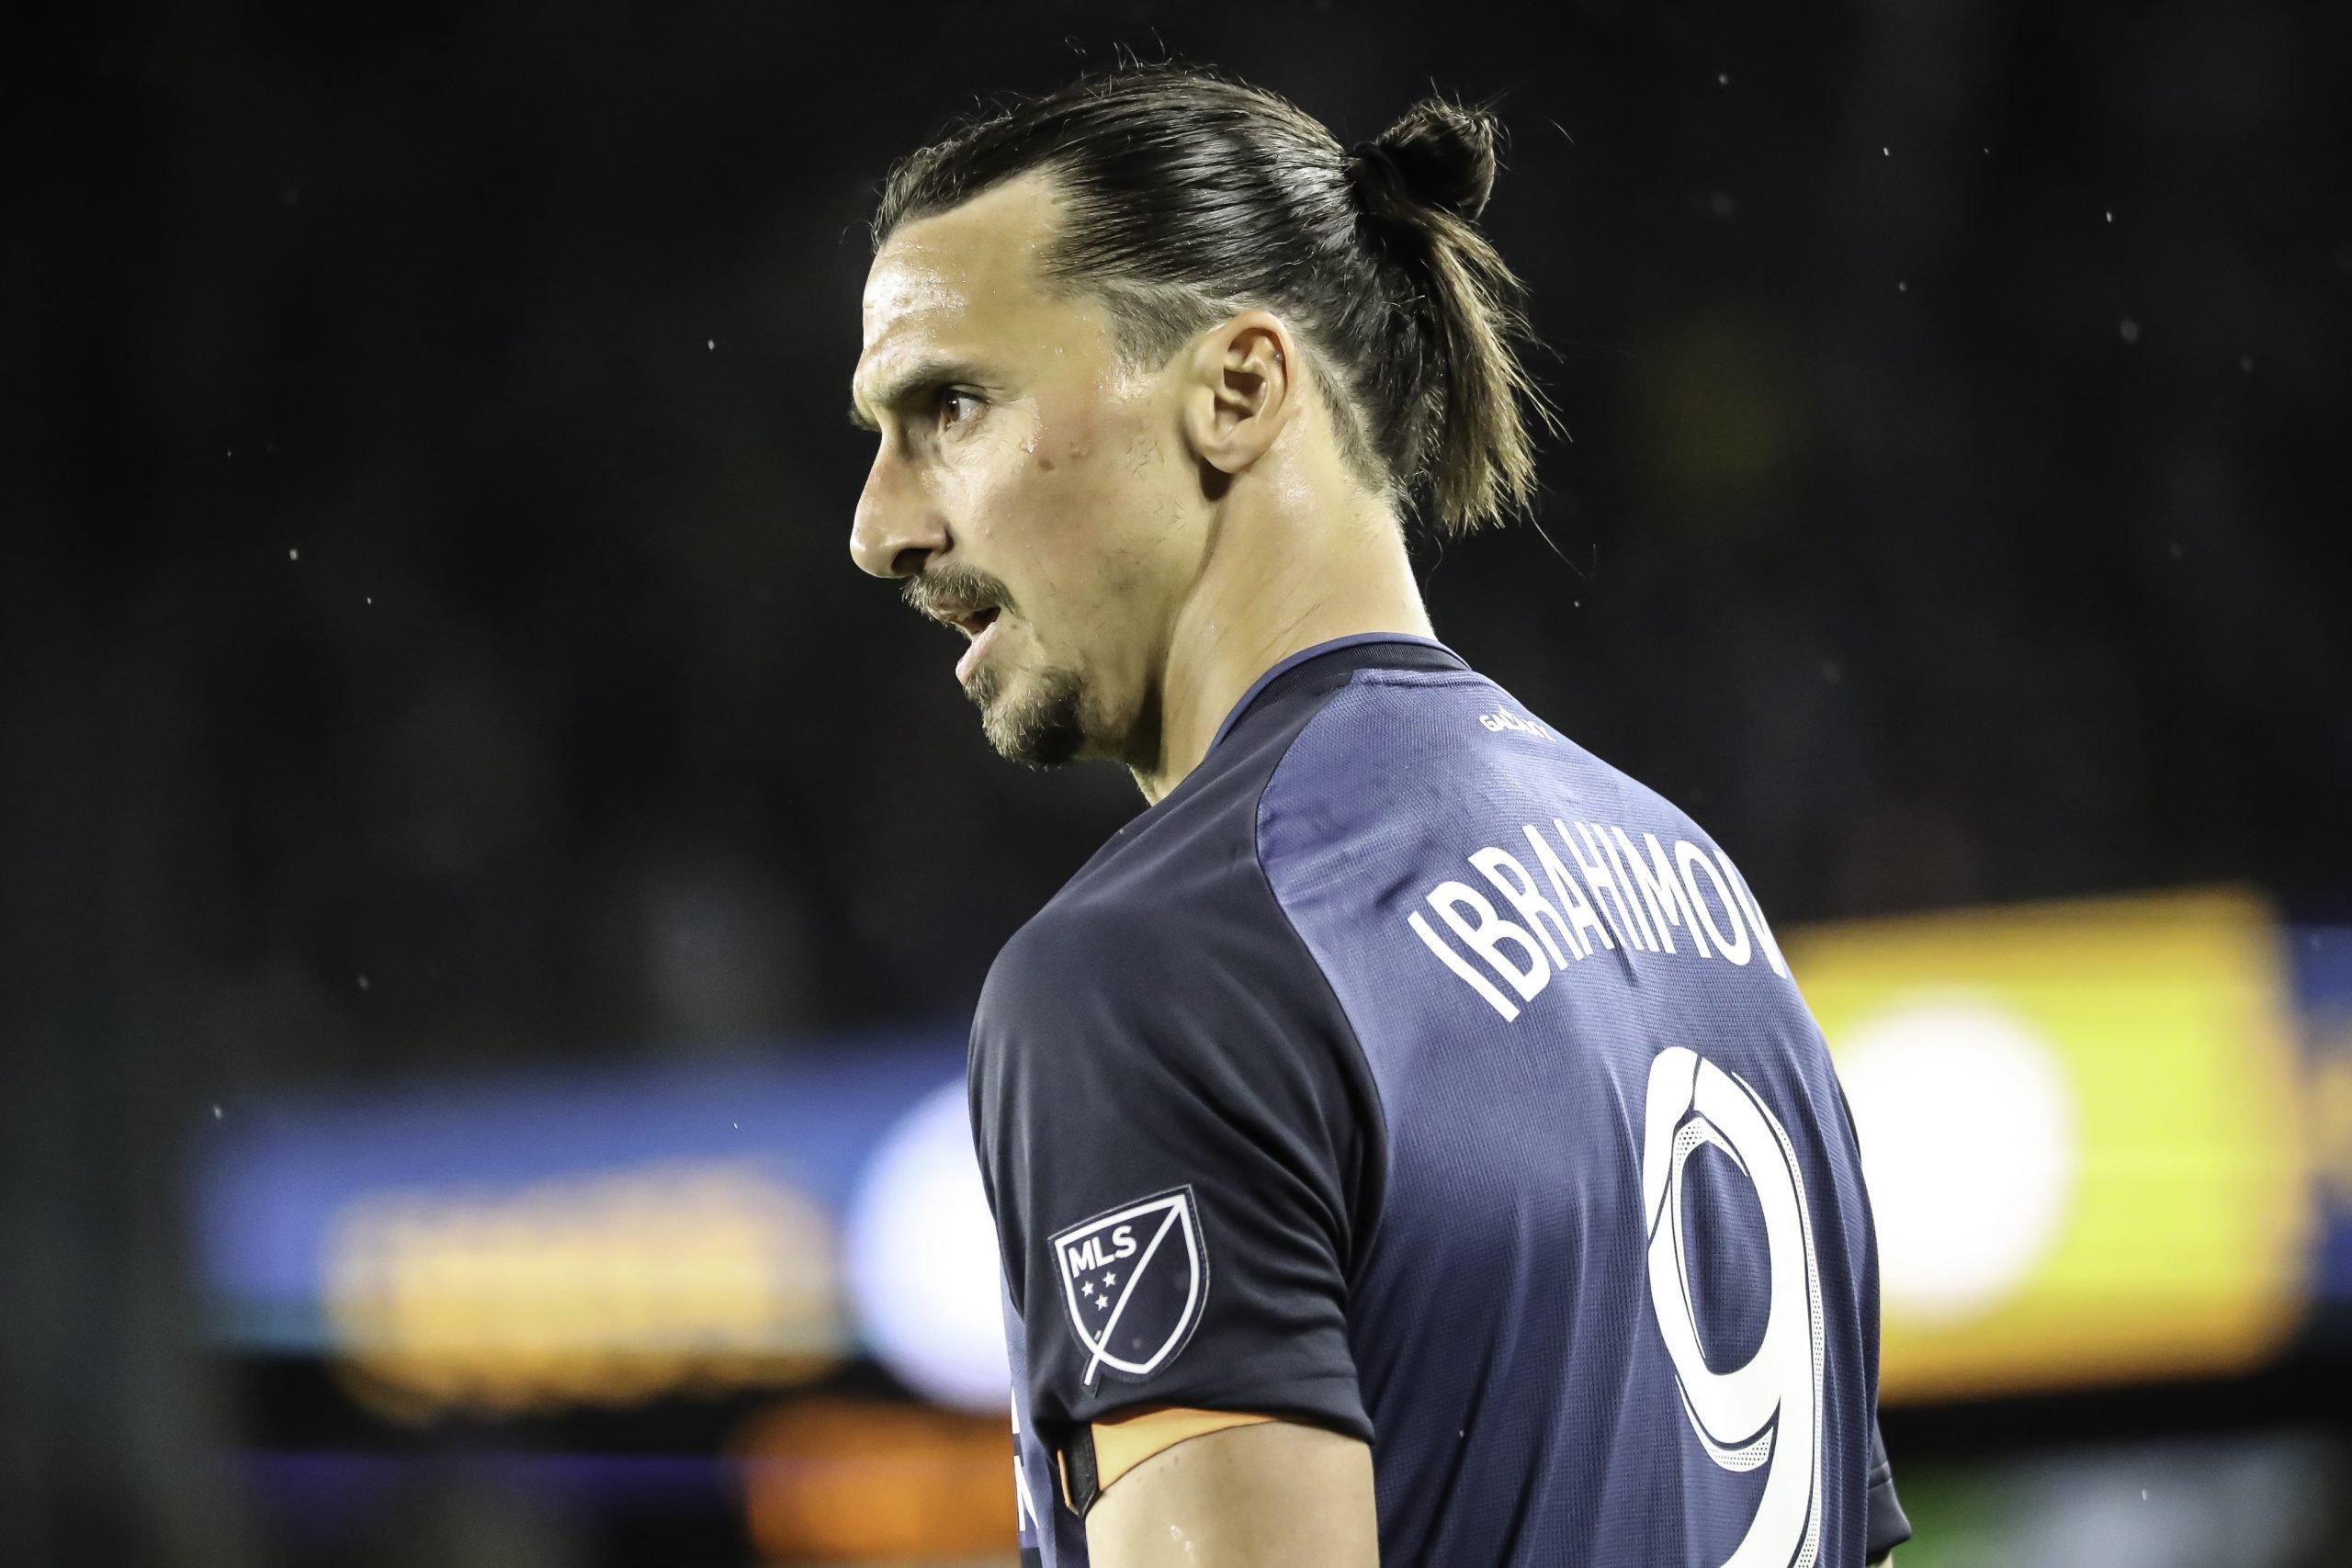 Fußball: Das Phänomen Zlatan Ibrahimovic